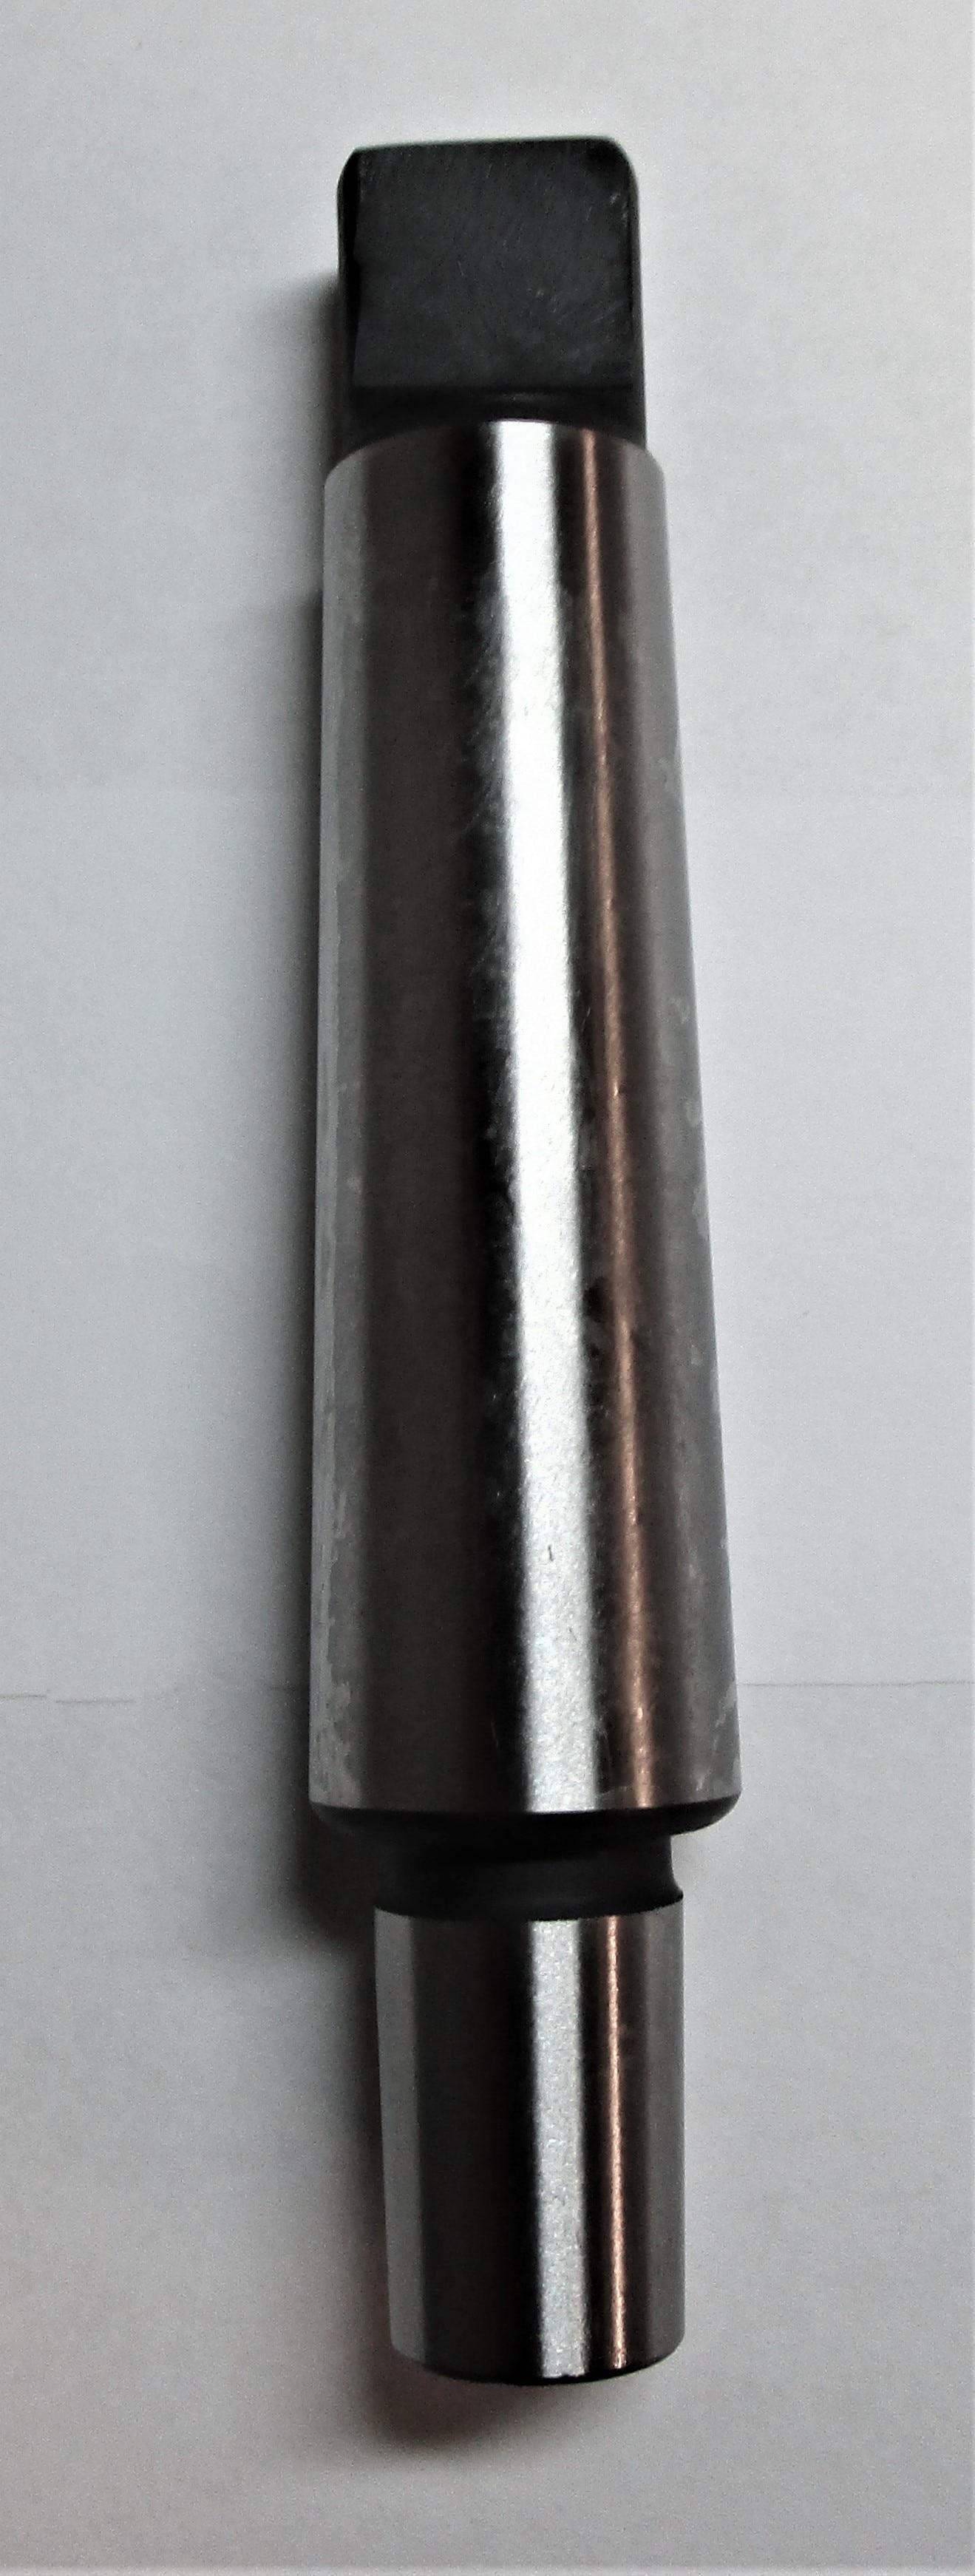 MT-3 x JT-6 Drill Chuck Arbor